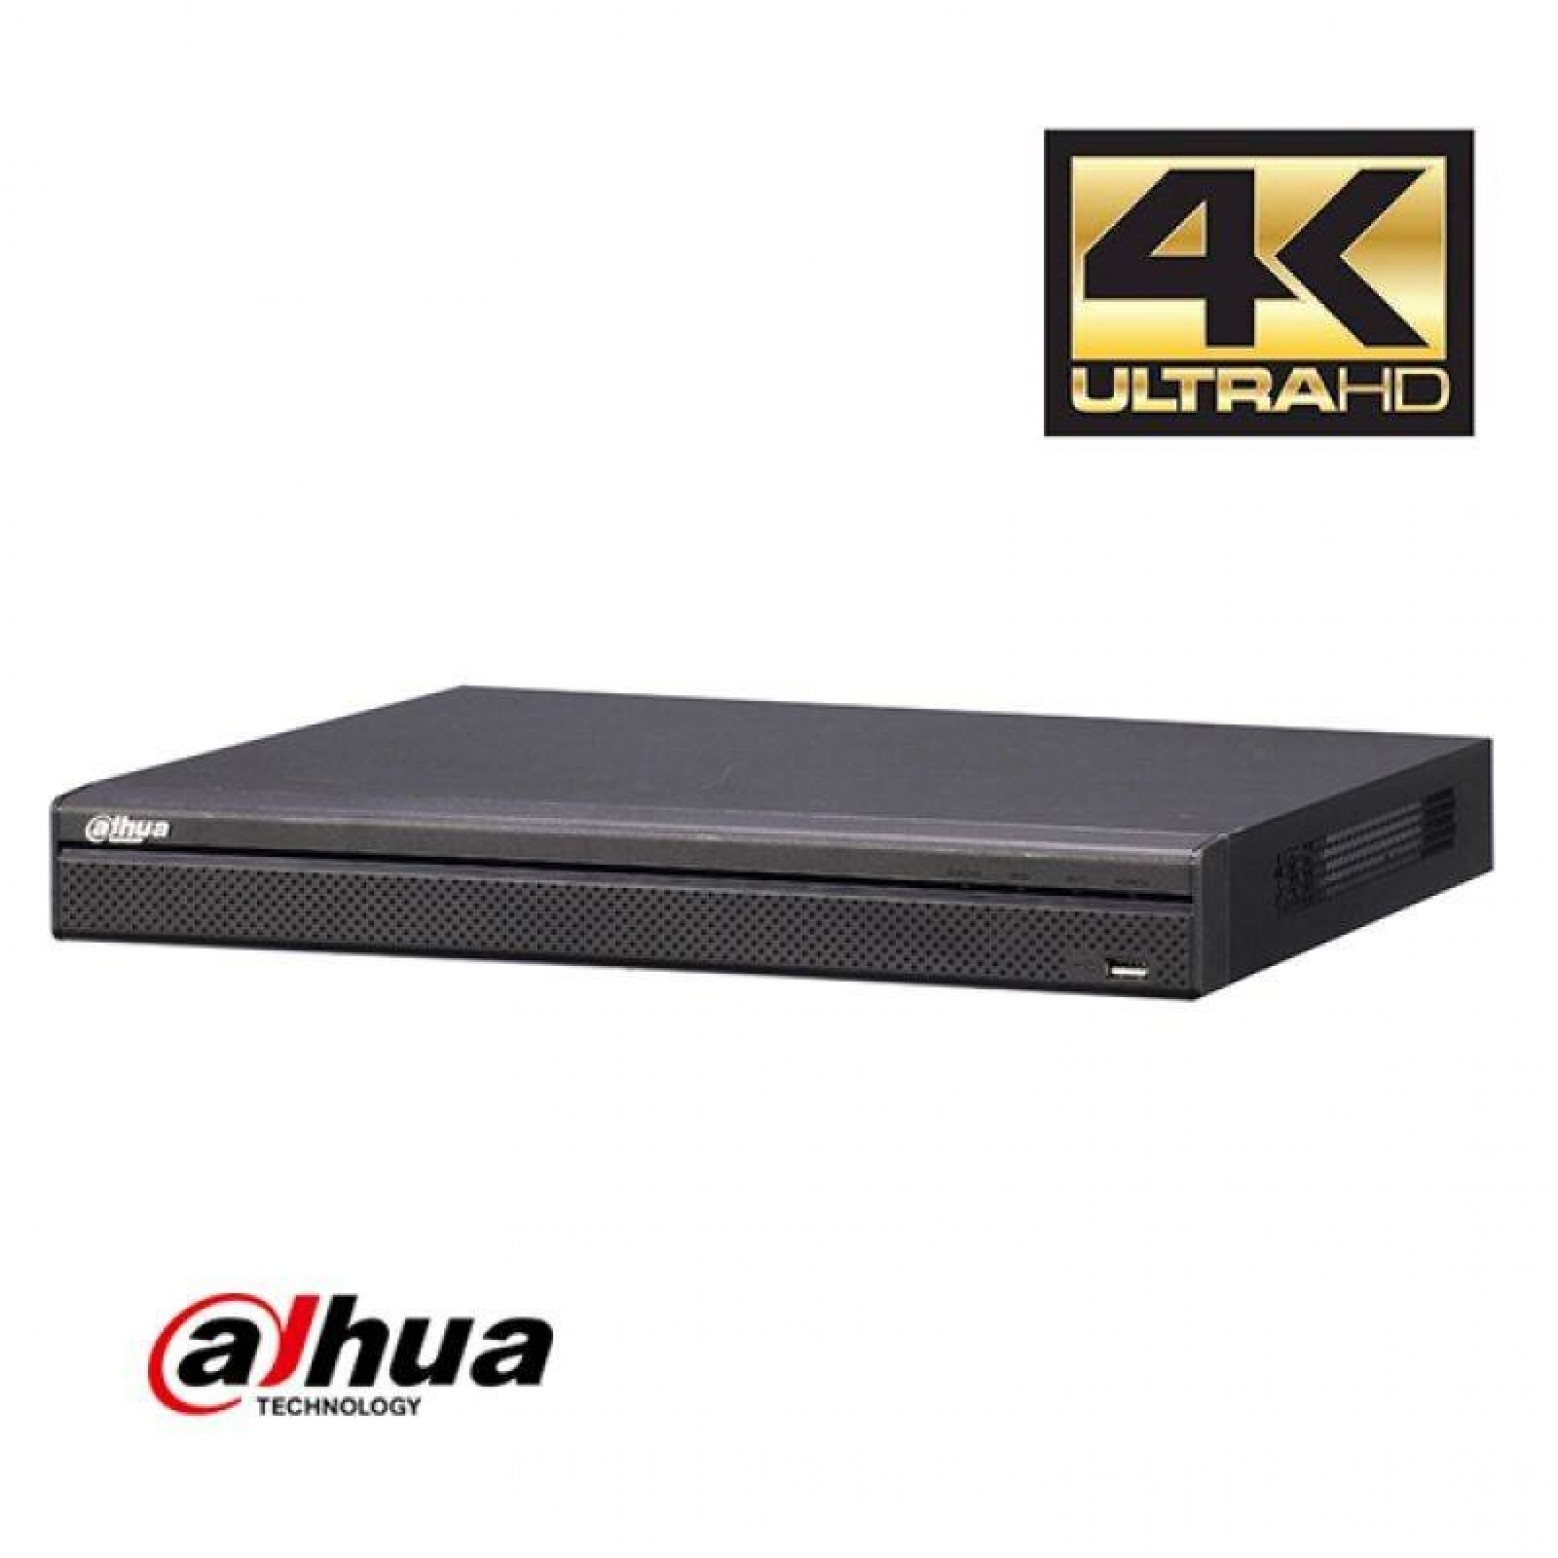 Dahua NVR4108HS-8P-4KS2 8 kanaals Compact 1U 8PoE 4K&H.265 Lite Network Video Recorder incl 2TB HDD